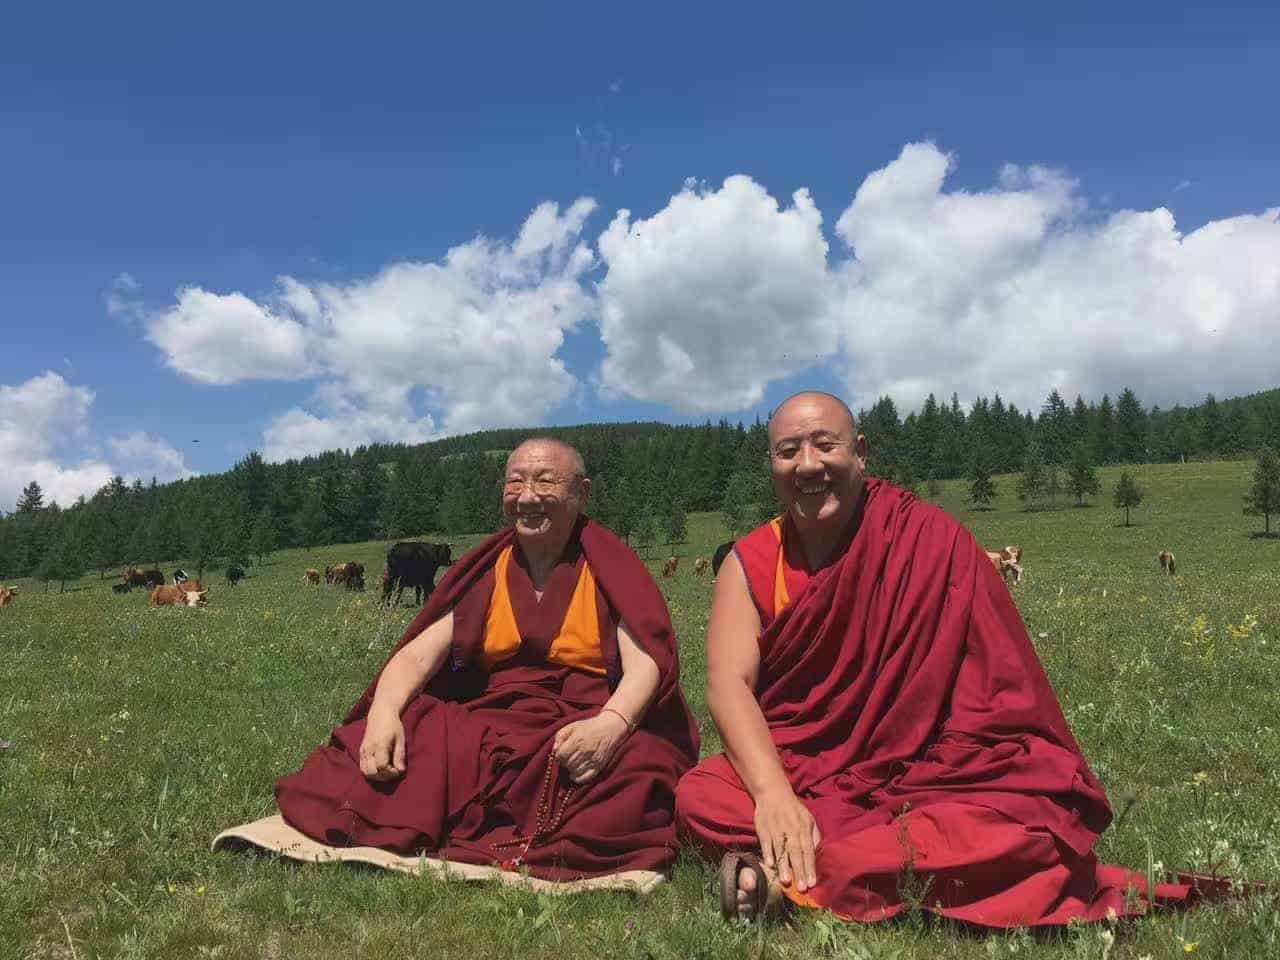 gosok-rinpoche-mongolia-2016-4db0f4ff70a1e4d3150bc75685c7c60